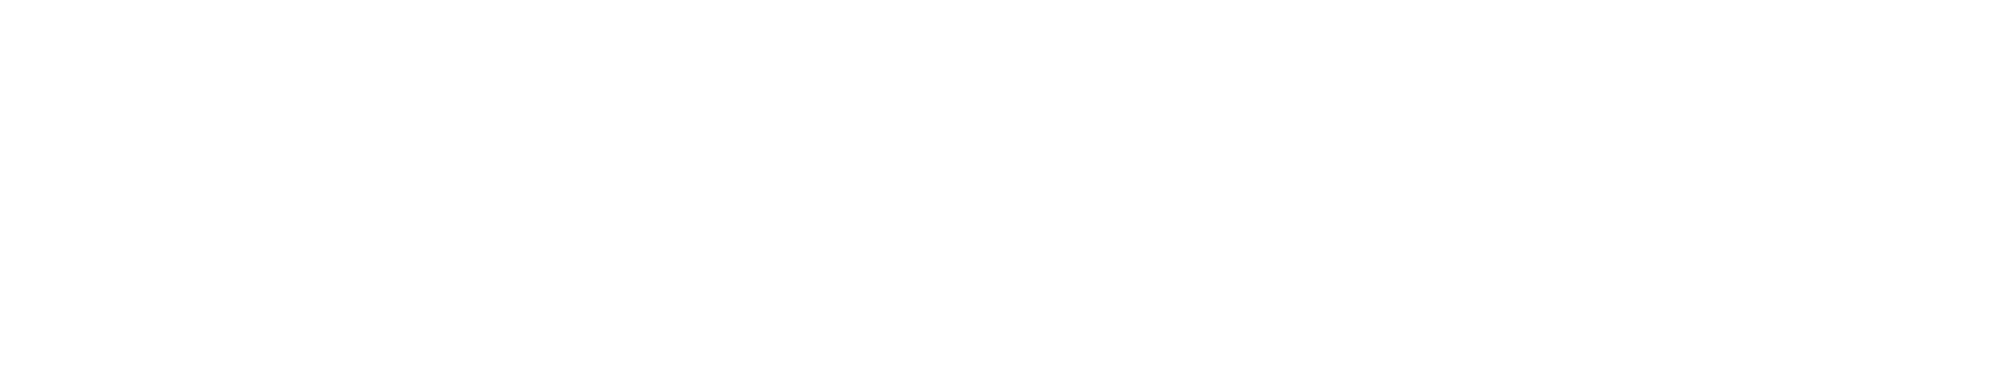 White Adracare logo